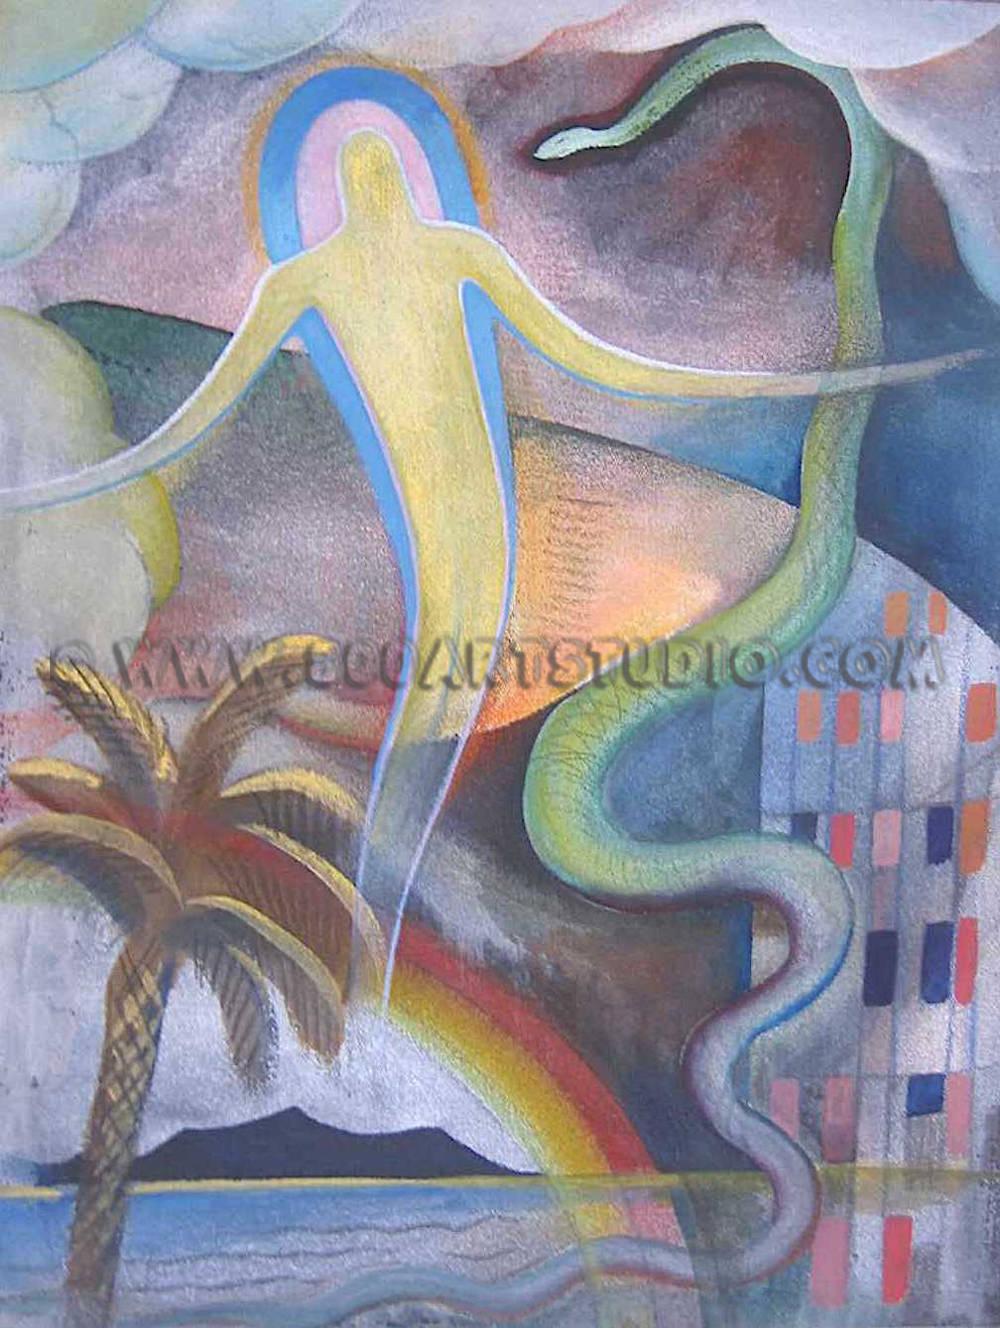 Ernesto Michahelles - Thayaht - Baruntico e serpente